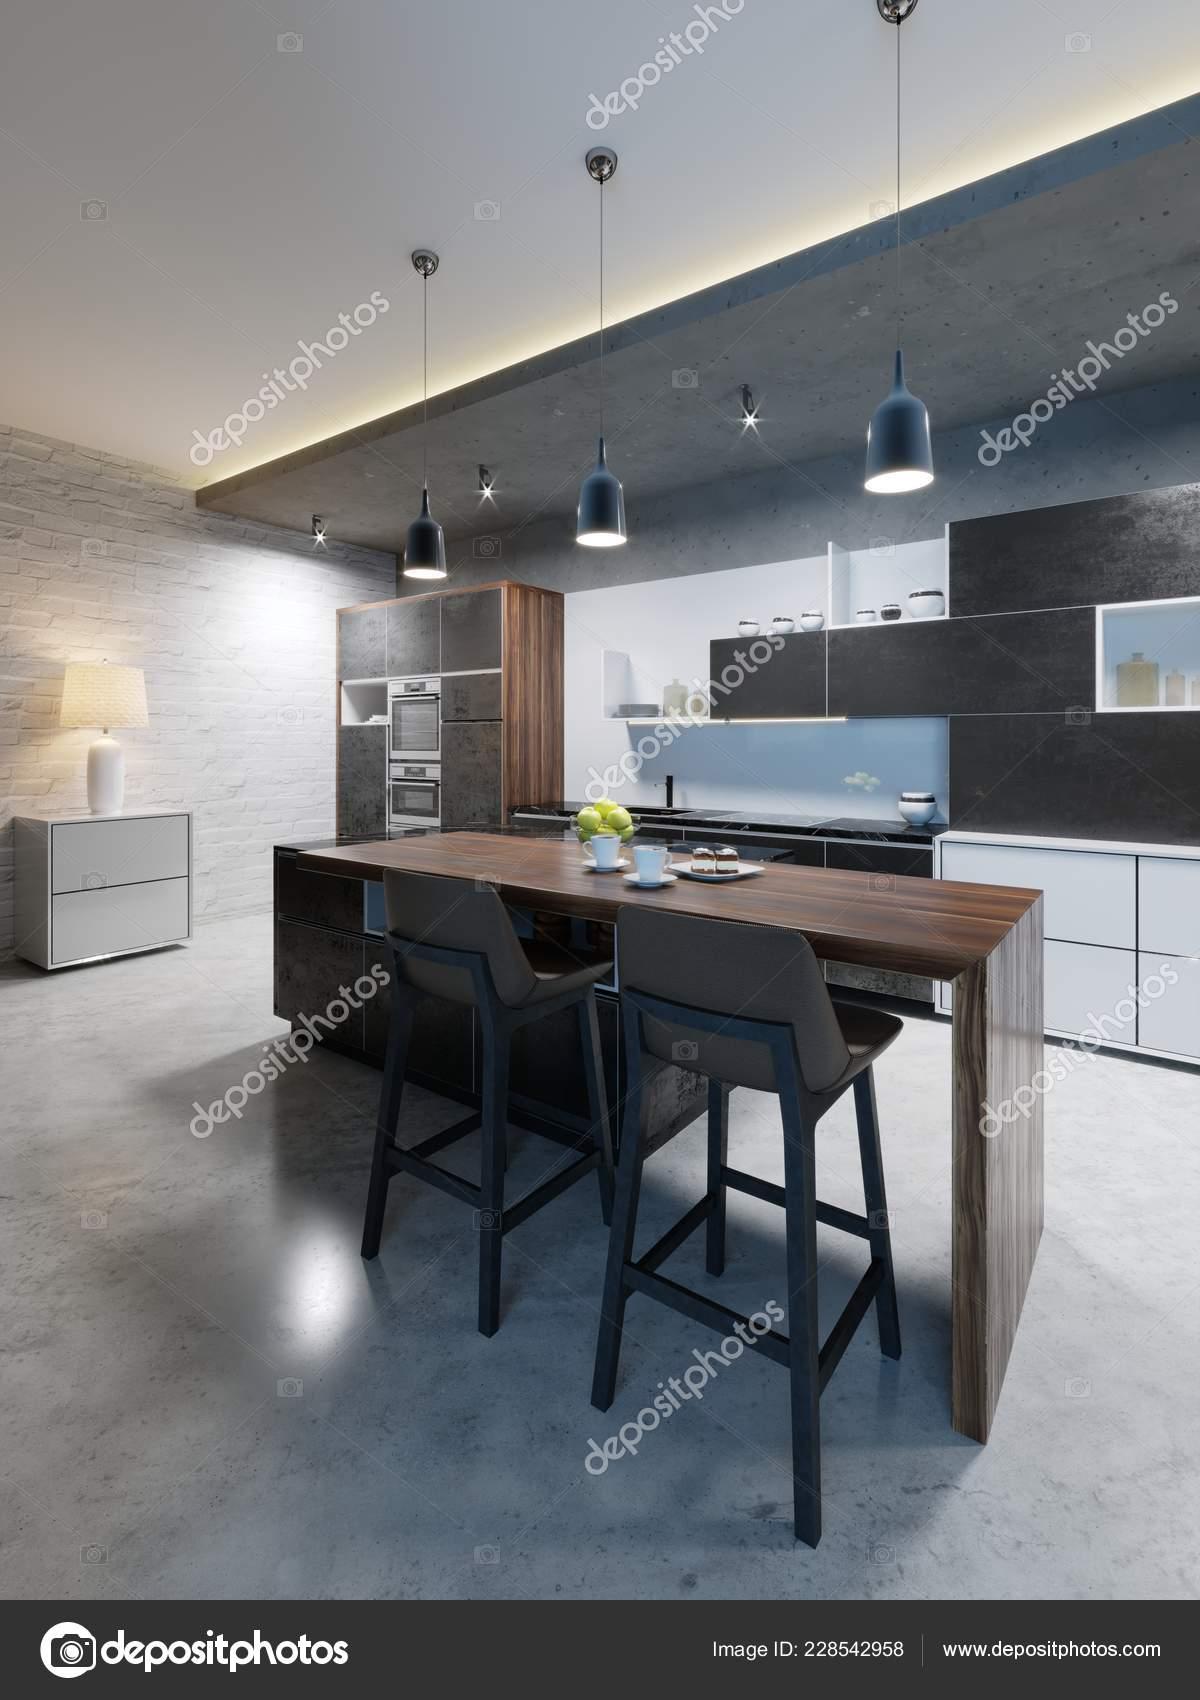 Picture of: Bar Counter Chairs Kitchen Island Modern Kitchen Evening Lighting Rendering Stock Photo C Kuprin33 228542958